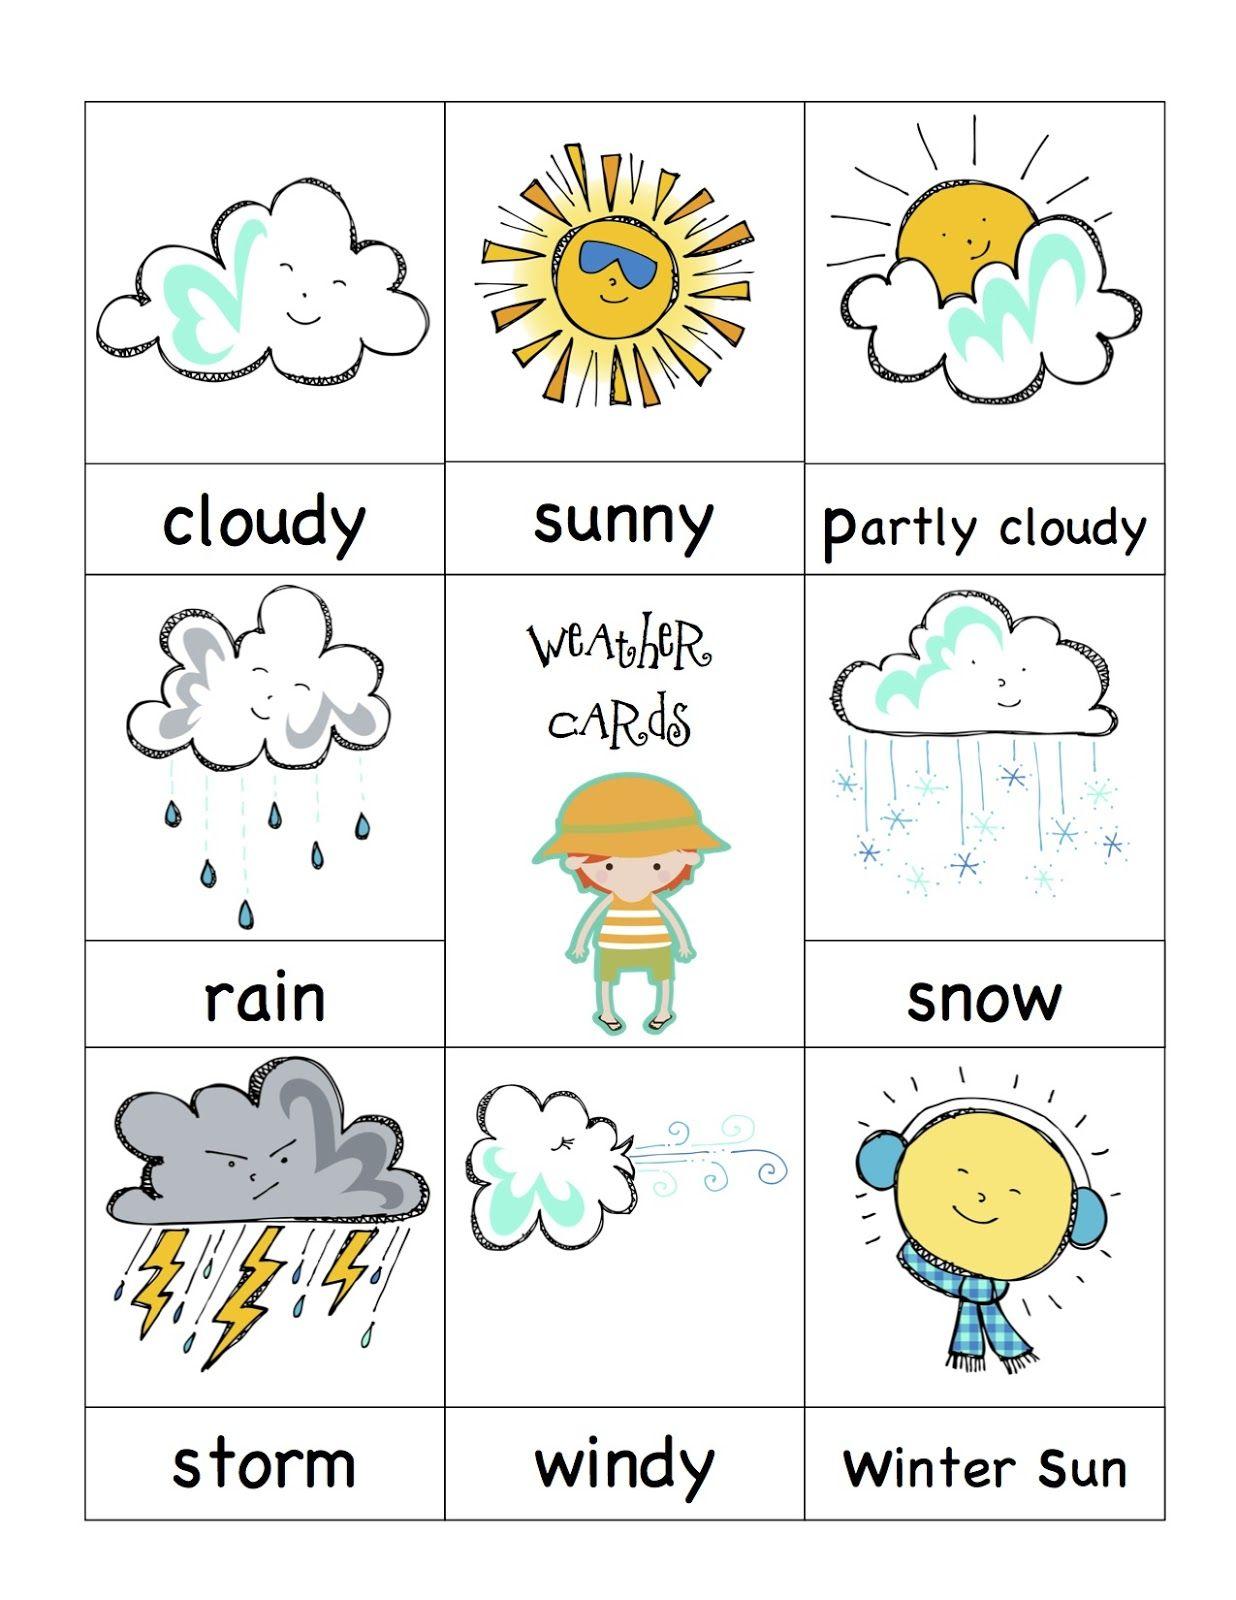 Weather cards atividades temas infantis e estaao weather cards preschool printables stopboris Image collections